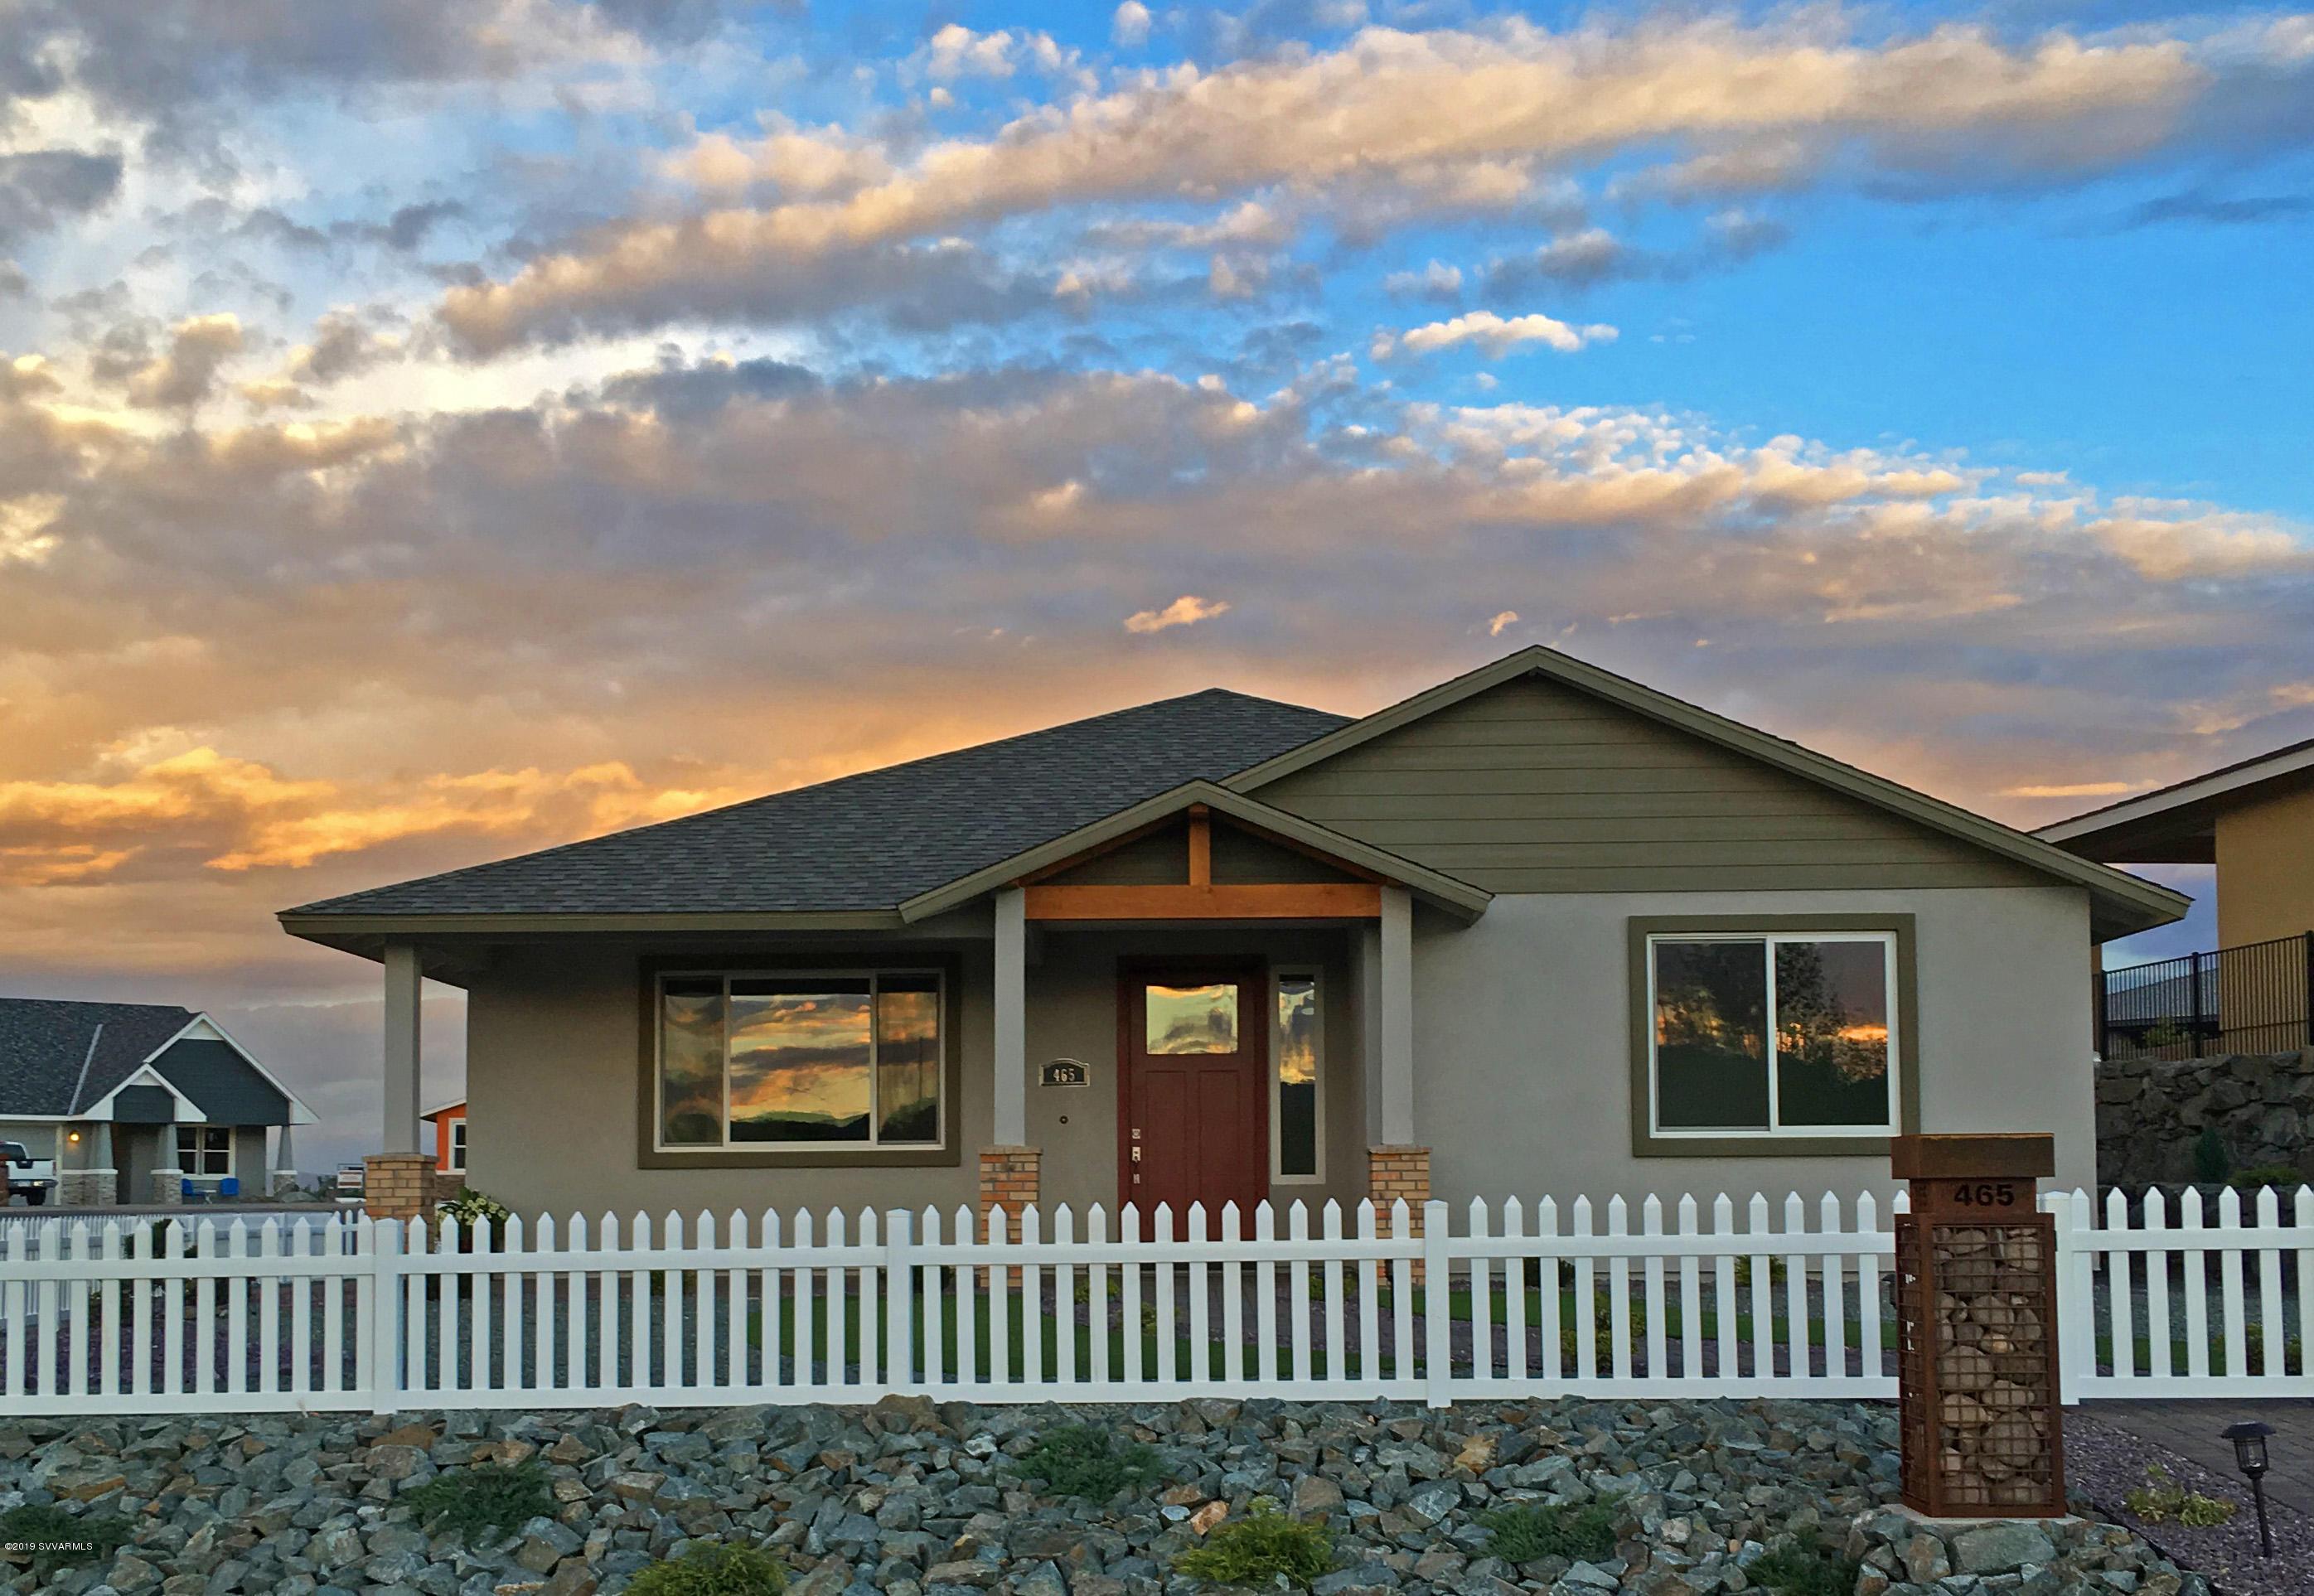 Photo of 465 Kindra Heights Rd, Cottonwood, AZ 86326